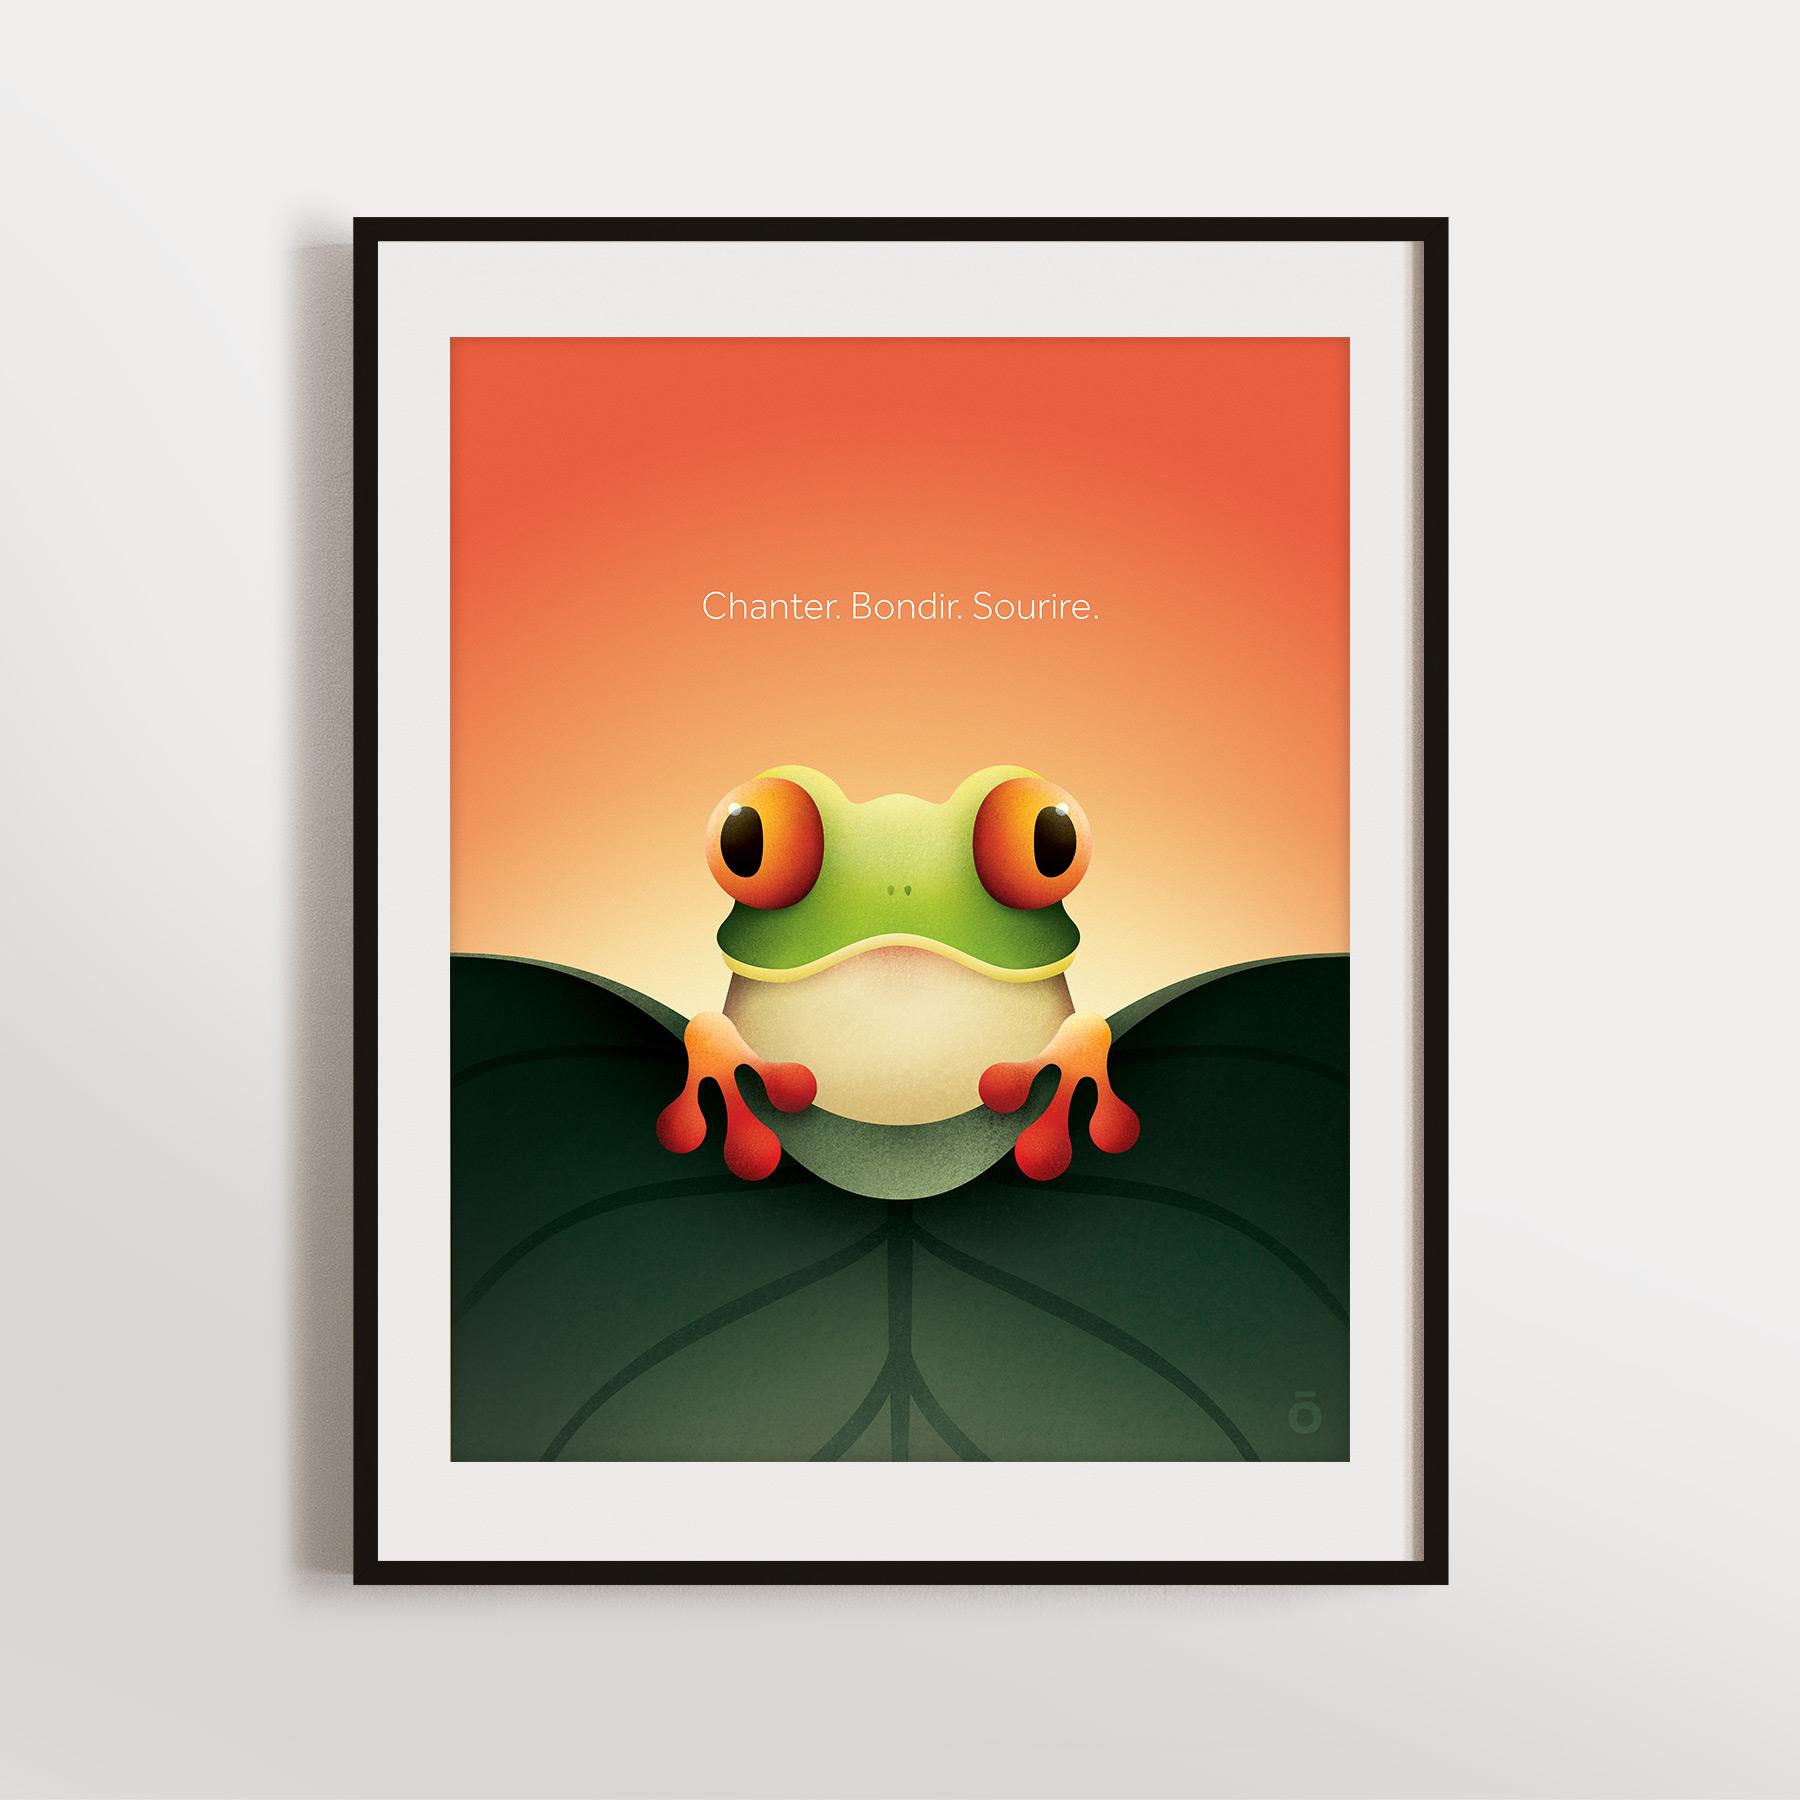 Affiche rainette espiègle – Orange canicule